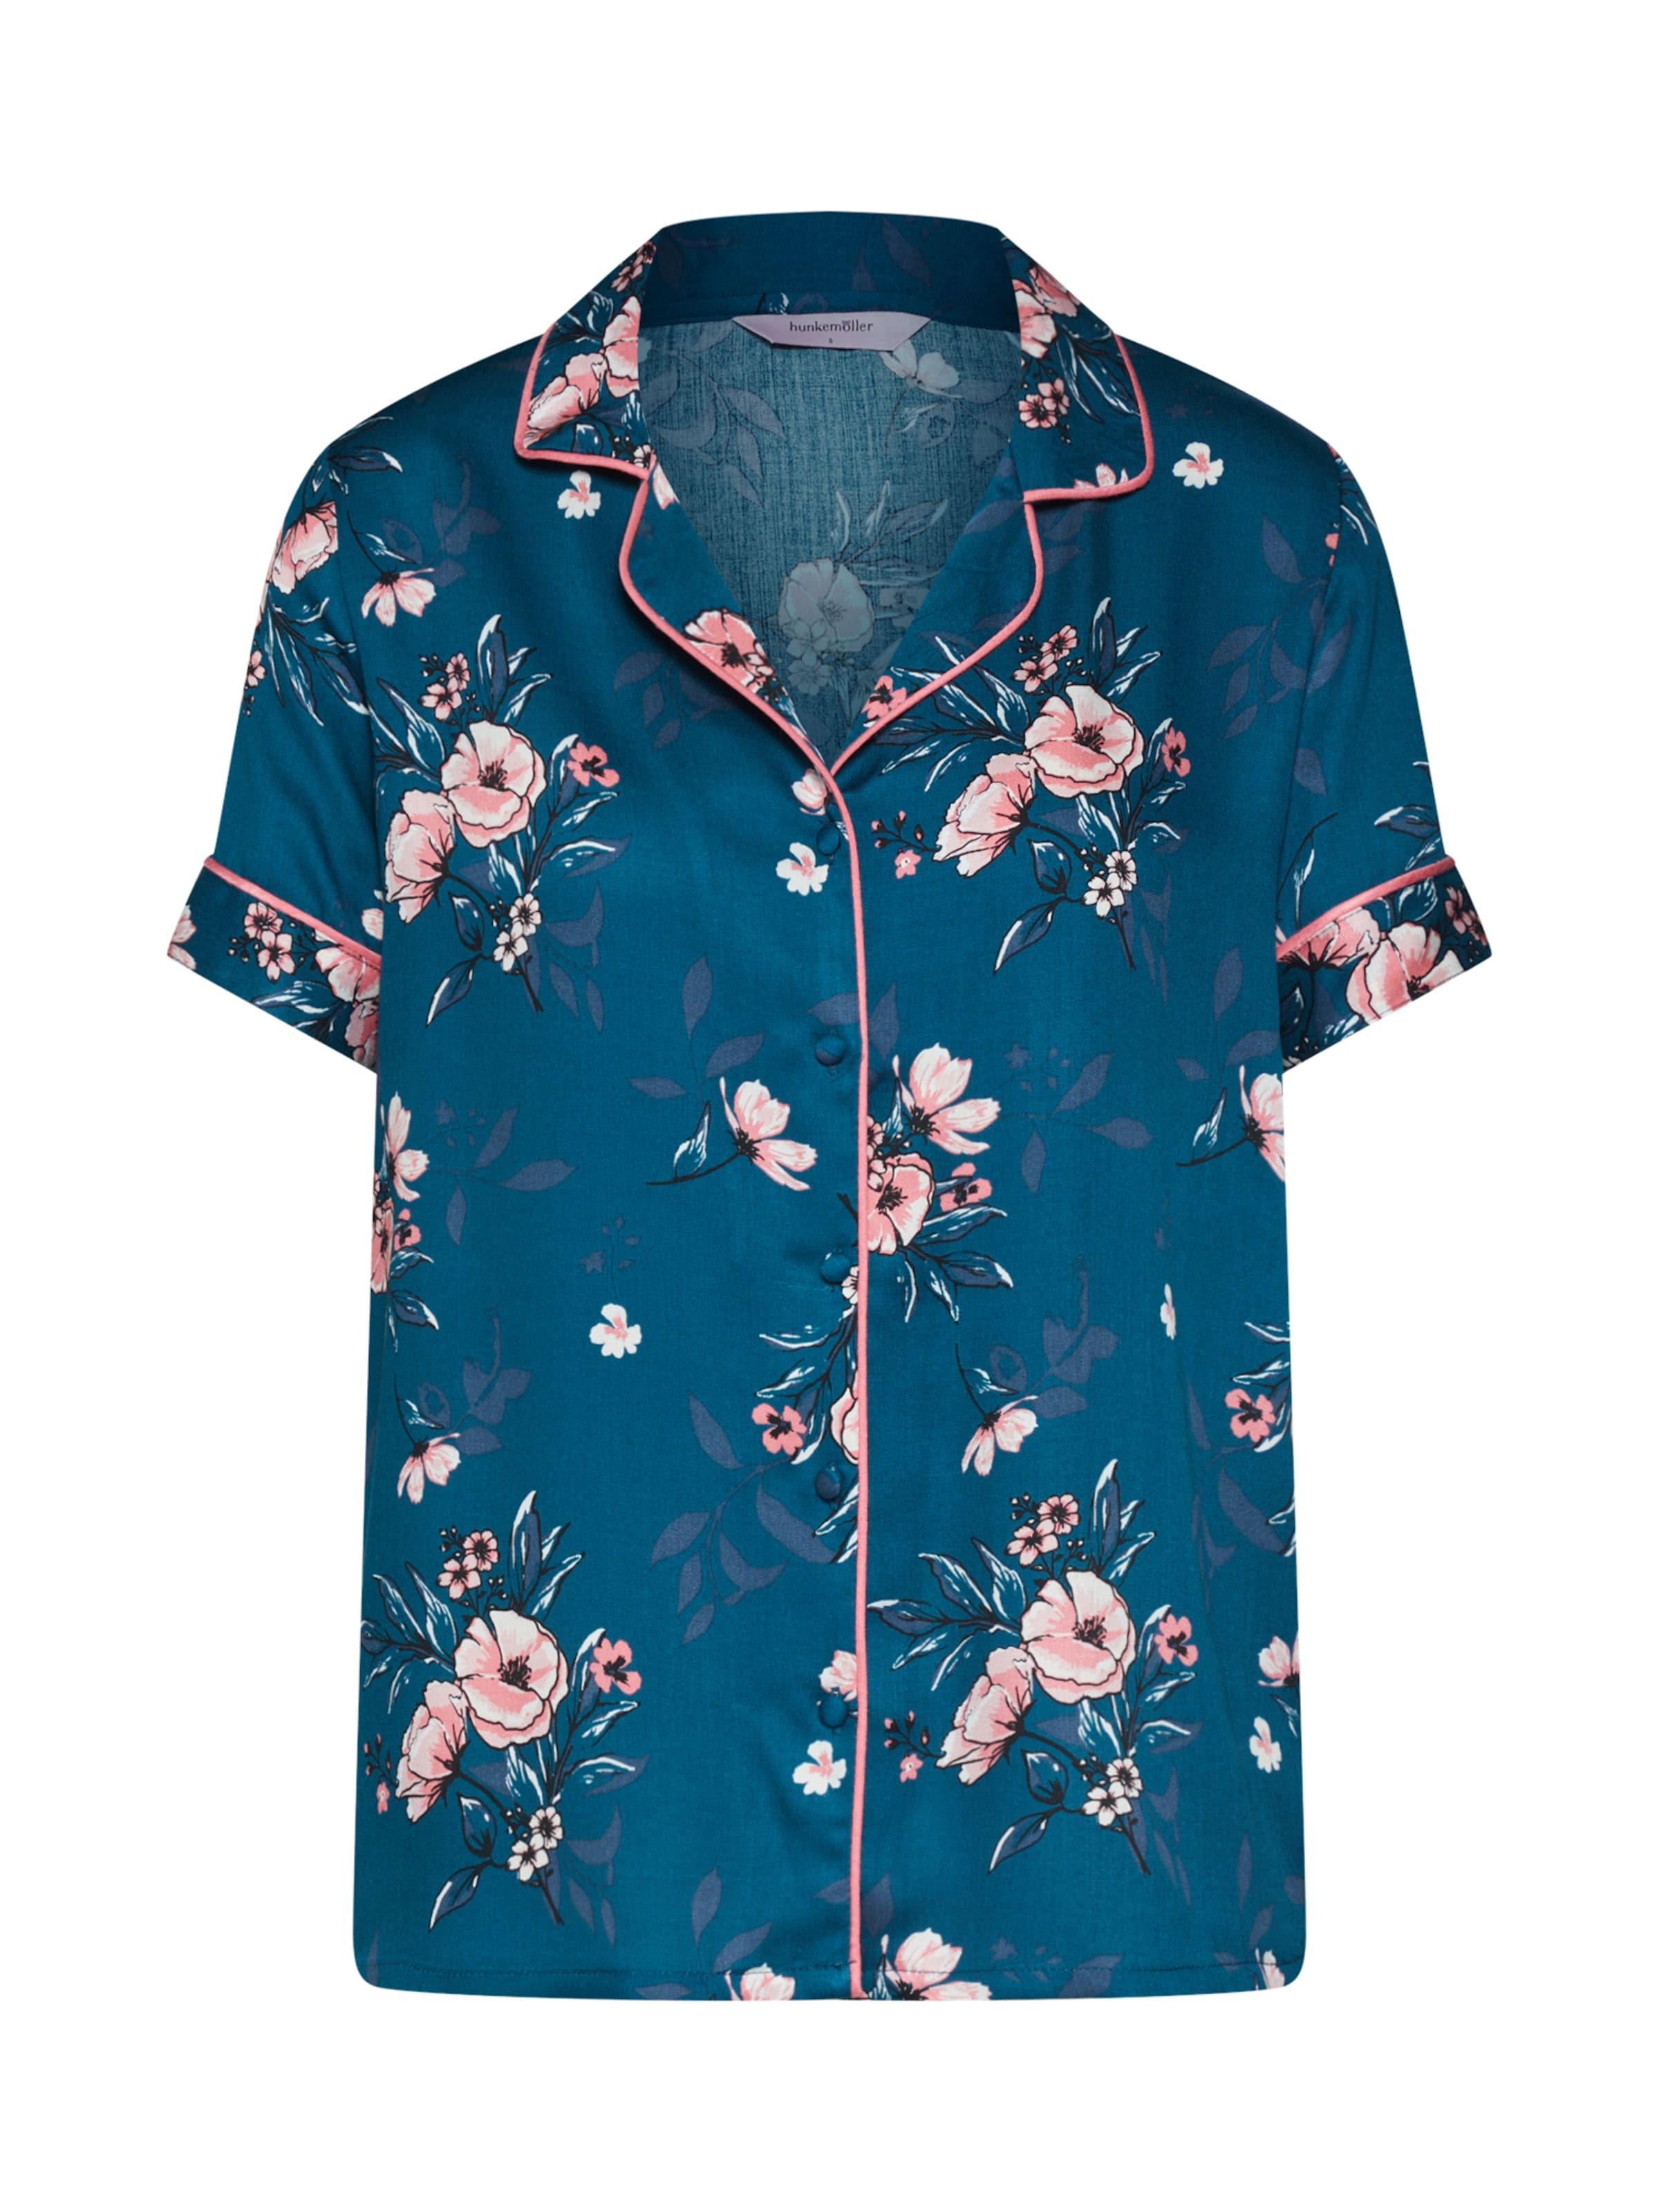 Chemise Ss De Nuit Bleu En Woven Rose' Hunkemöller 'jacket 5cALq4j3RS